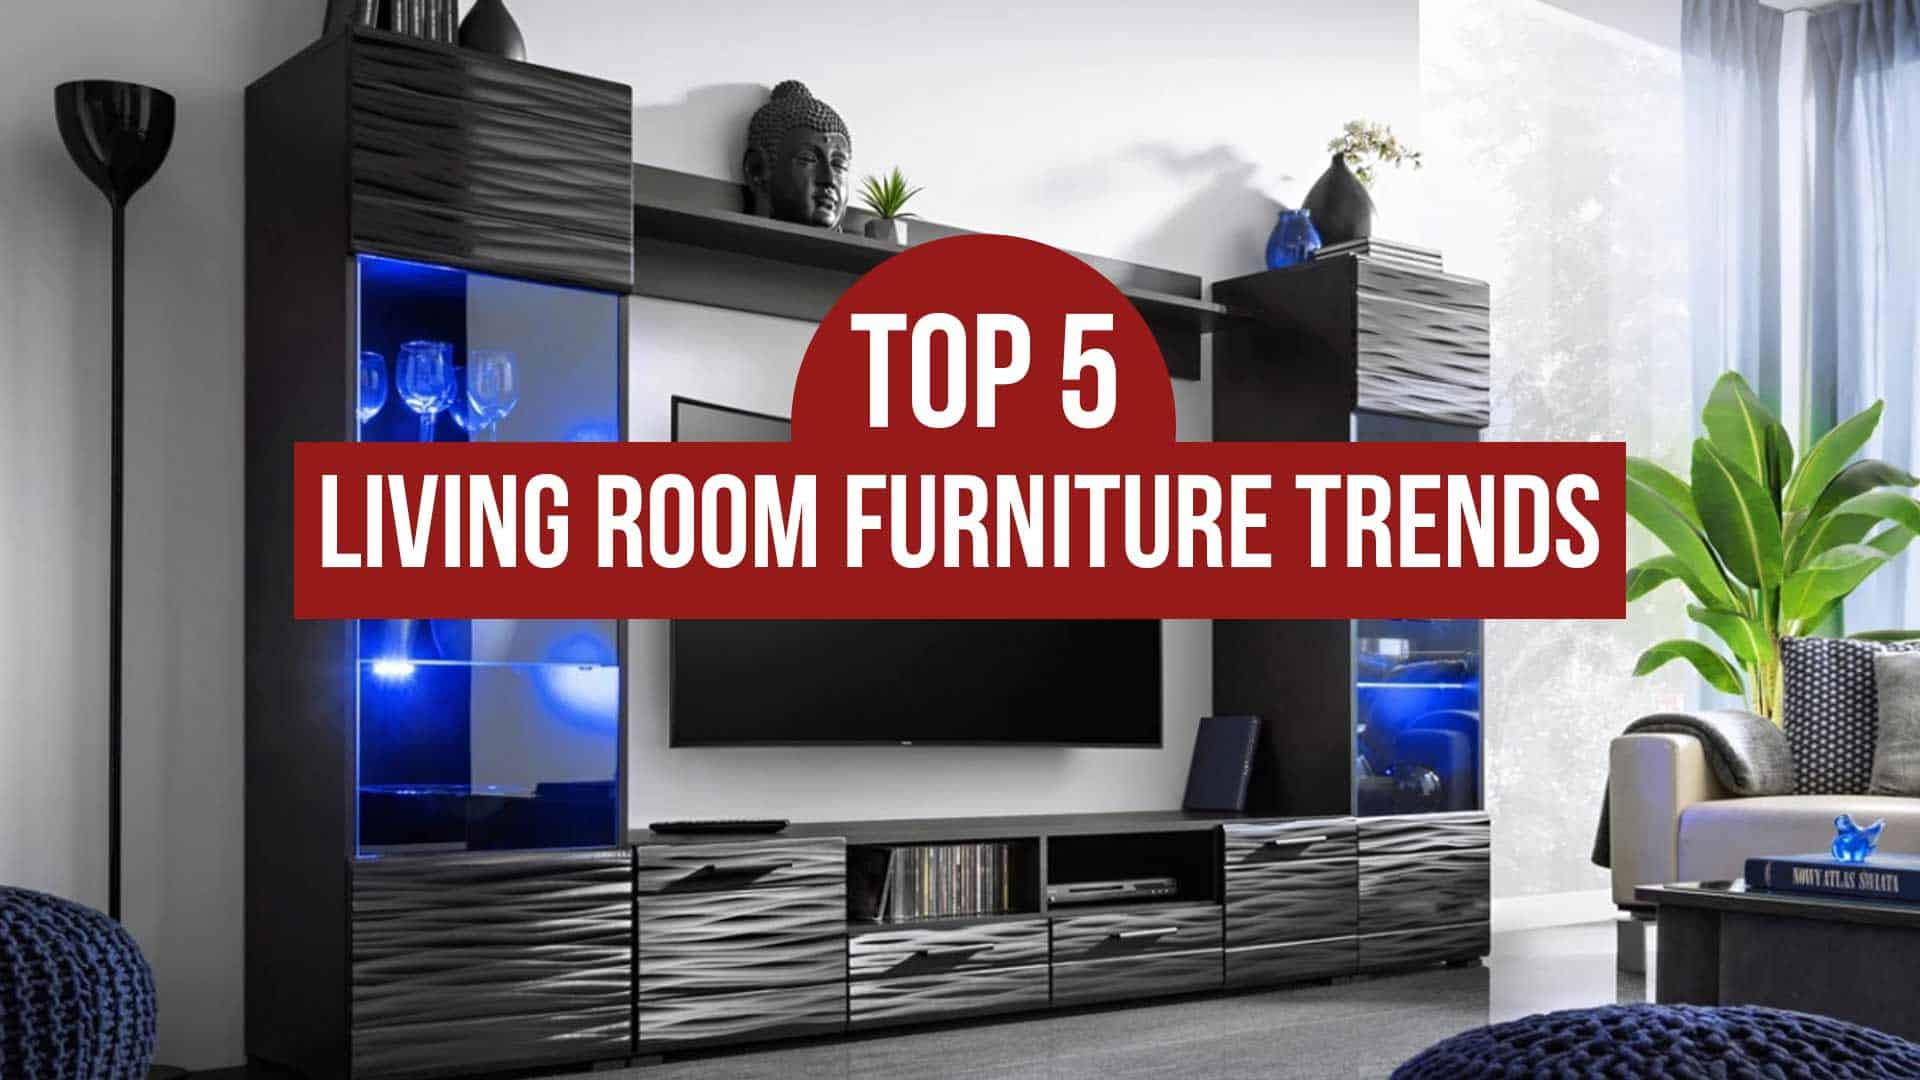 Top 5 Living Room Furniture Trends